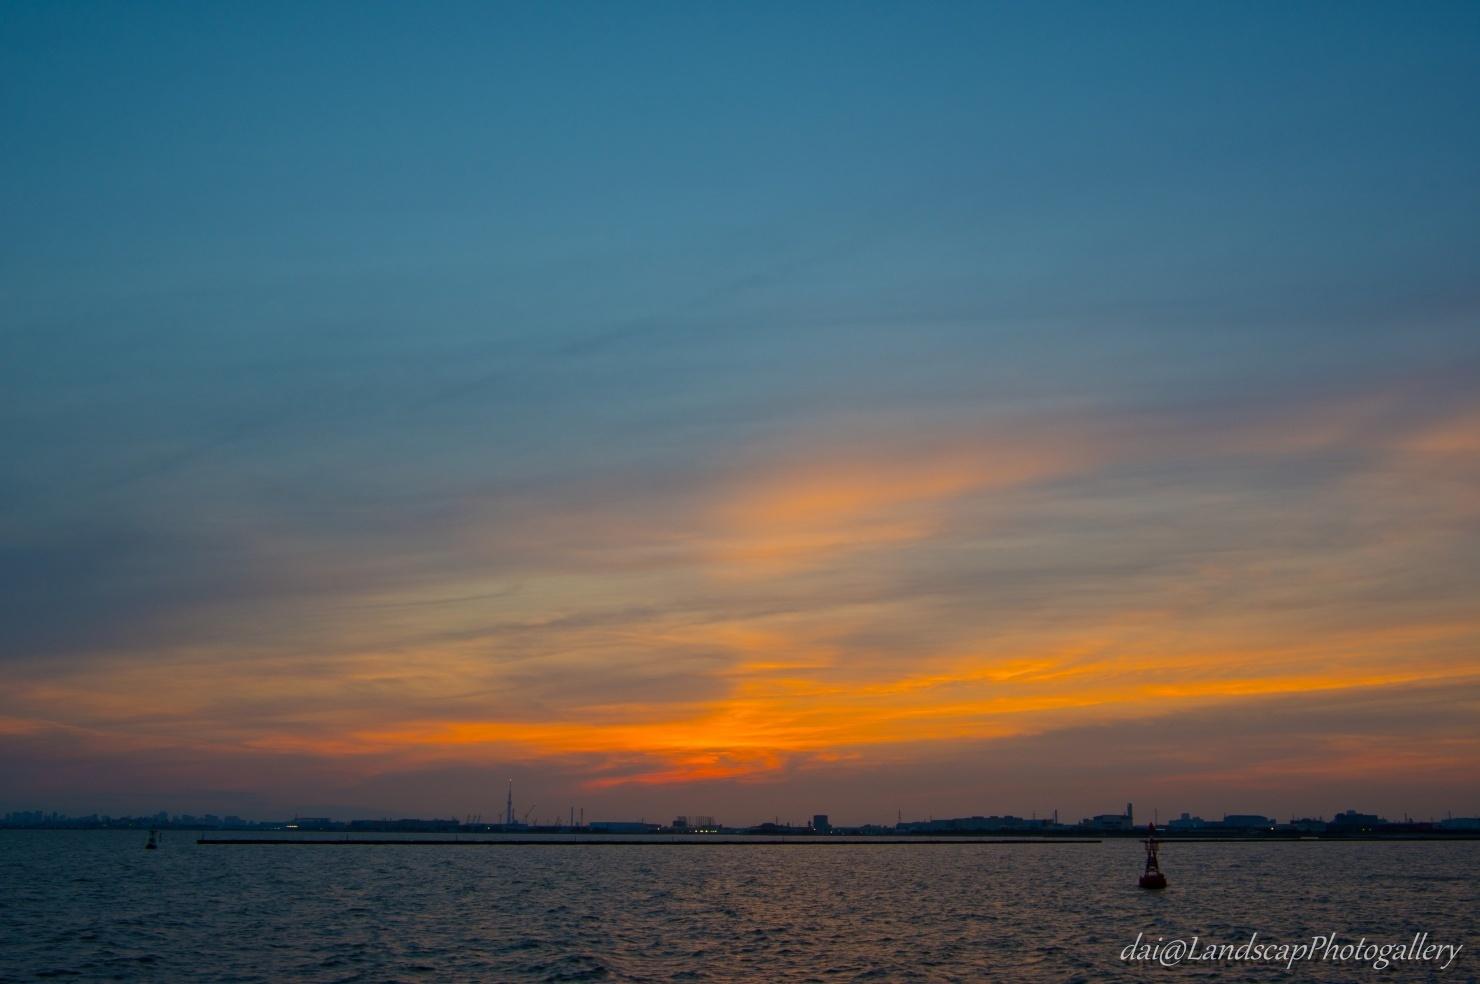 茜浜緑地公園付近の夕景